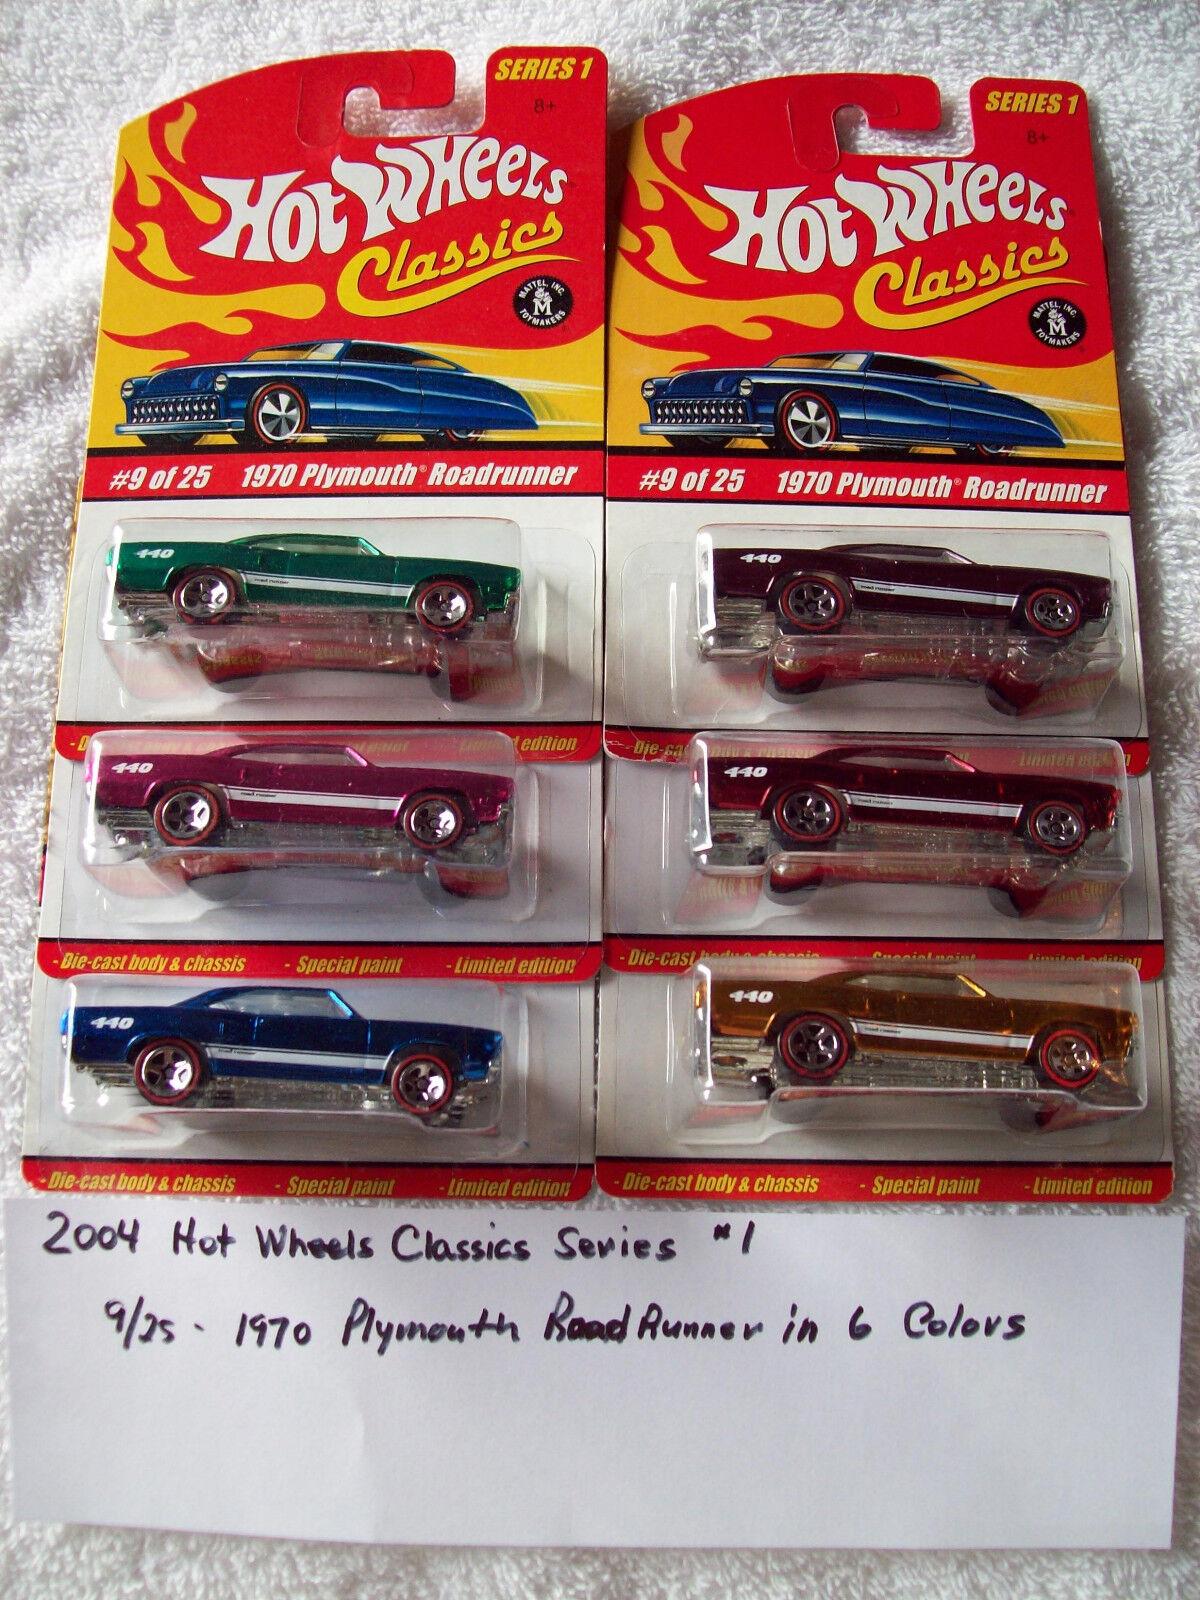 2004 Hot Wheel Classics Series 1 9 25 1970 Plymouth Roadrunner 6 color Car Set